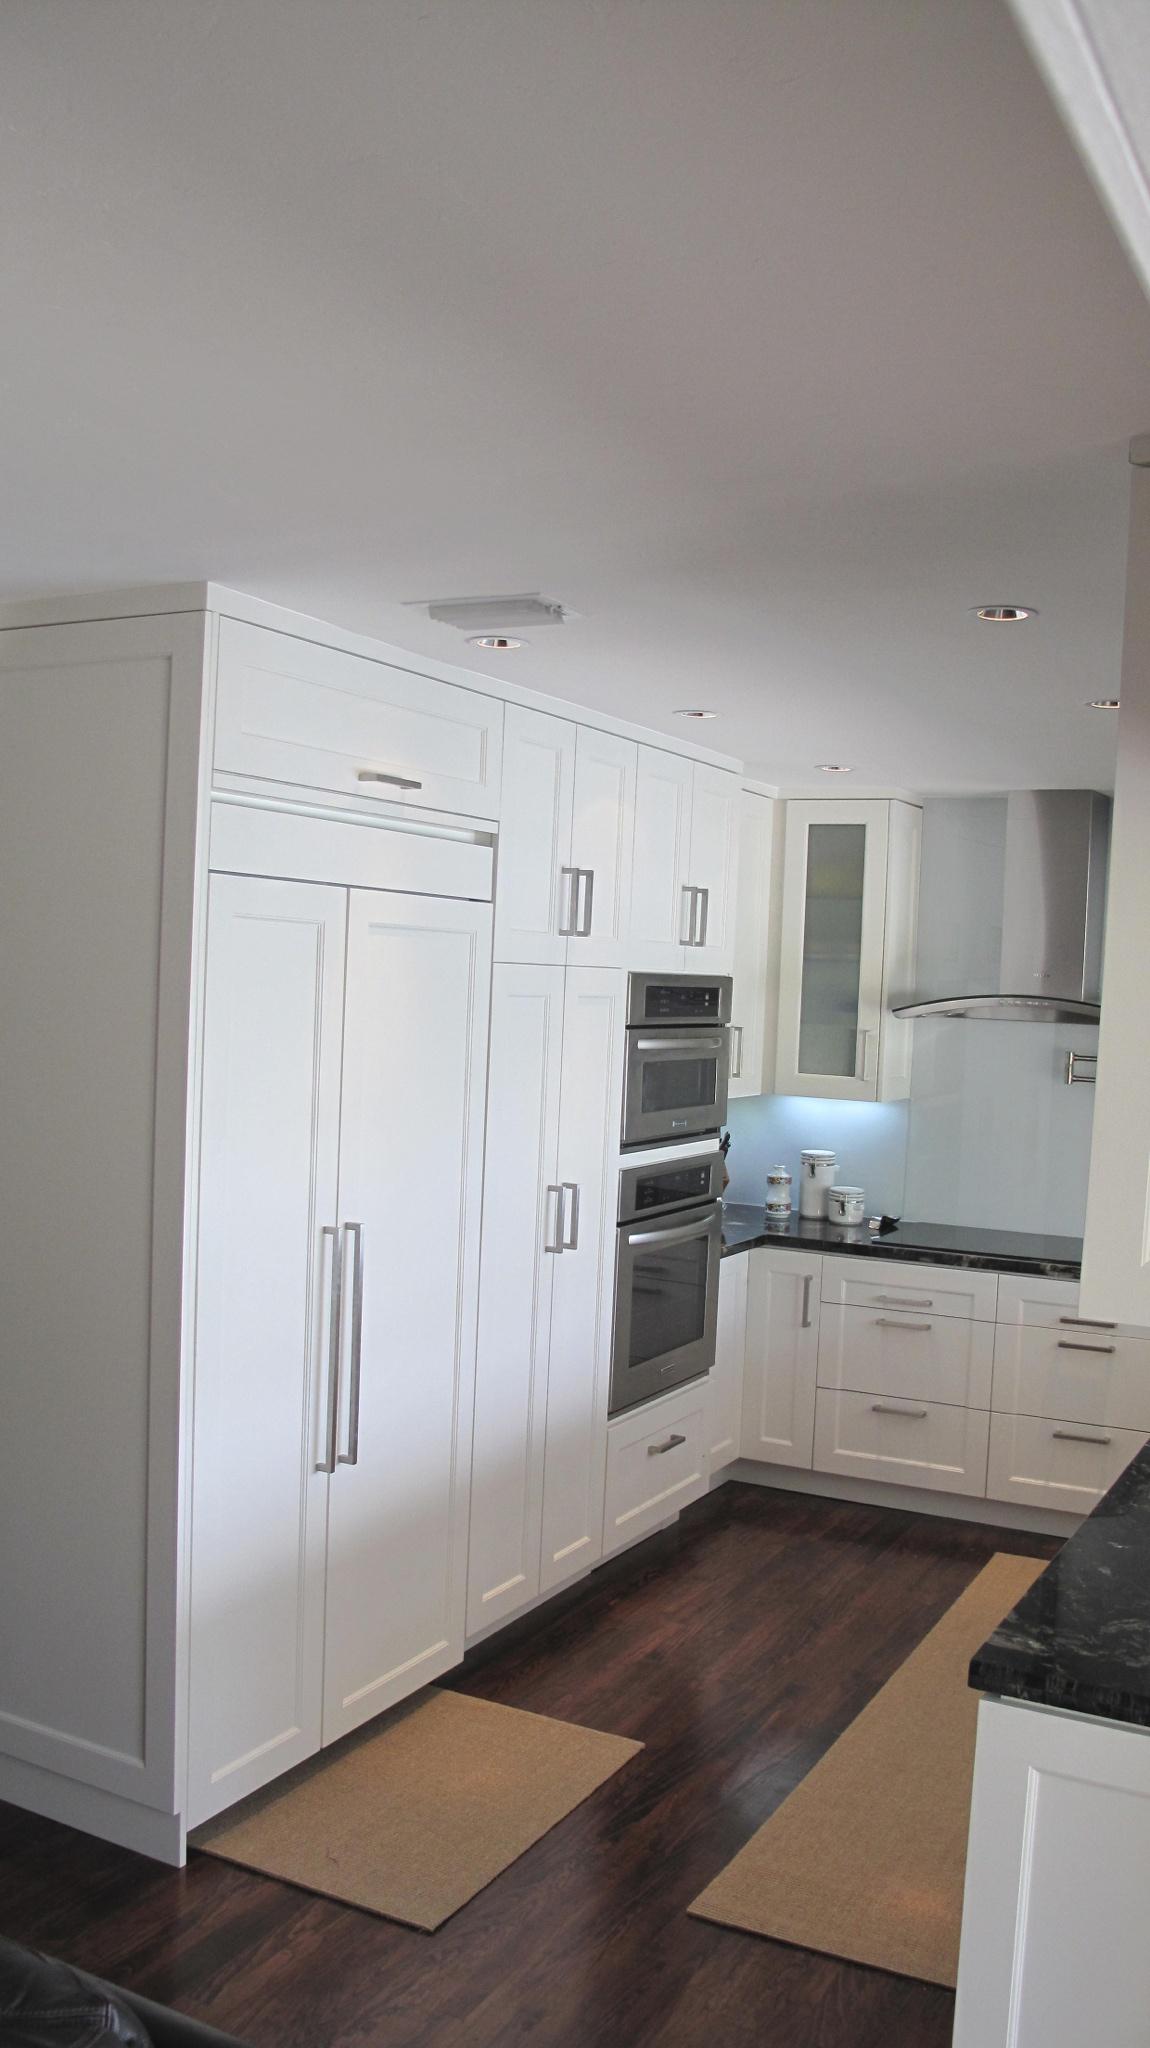 Kitchens-183.jpg